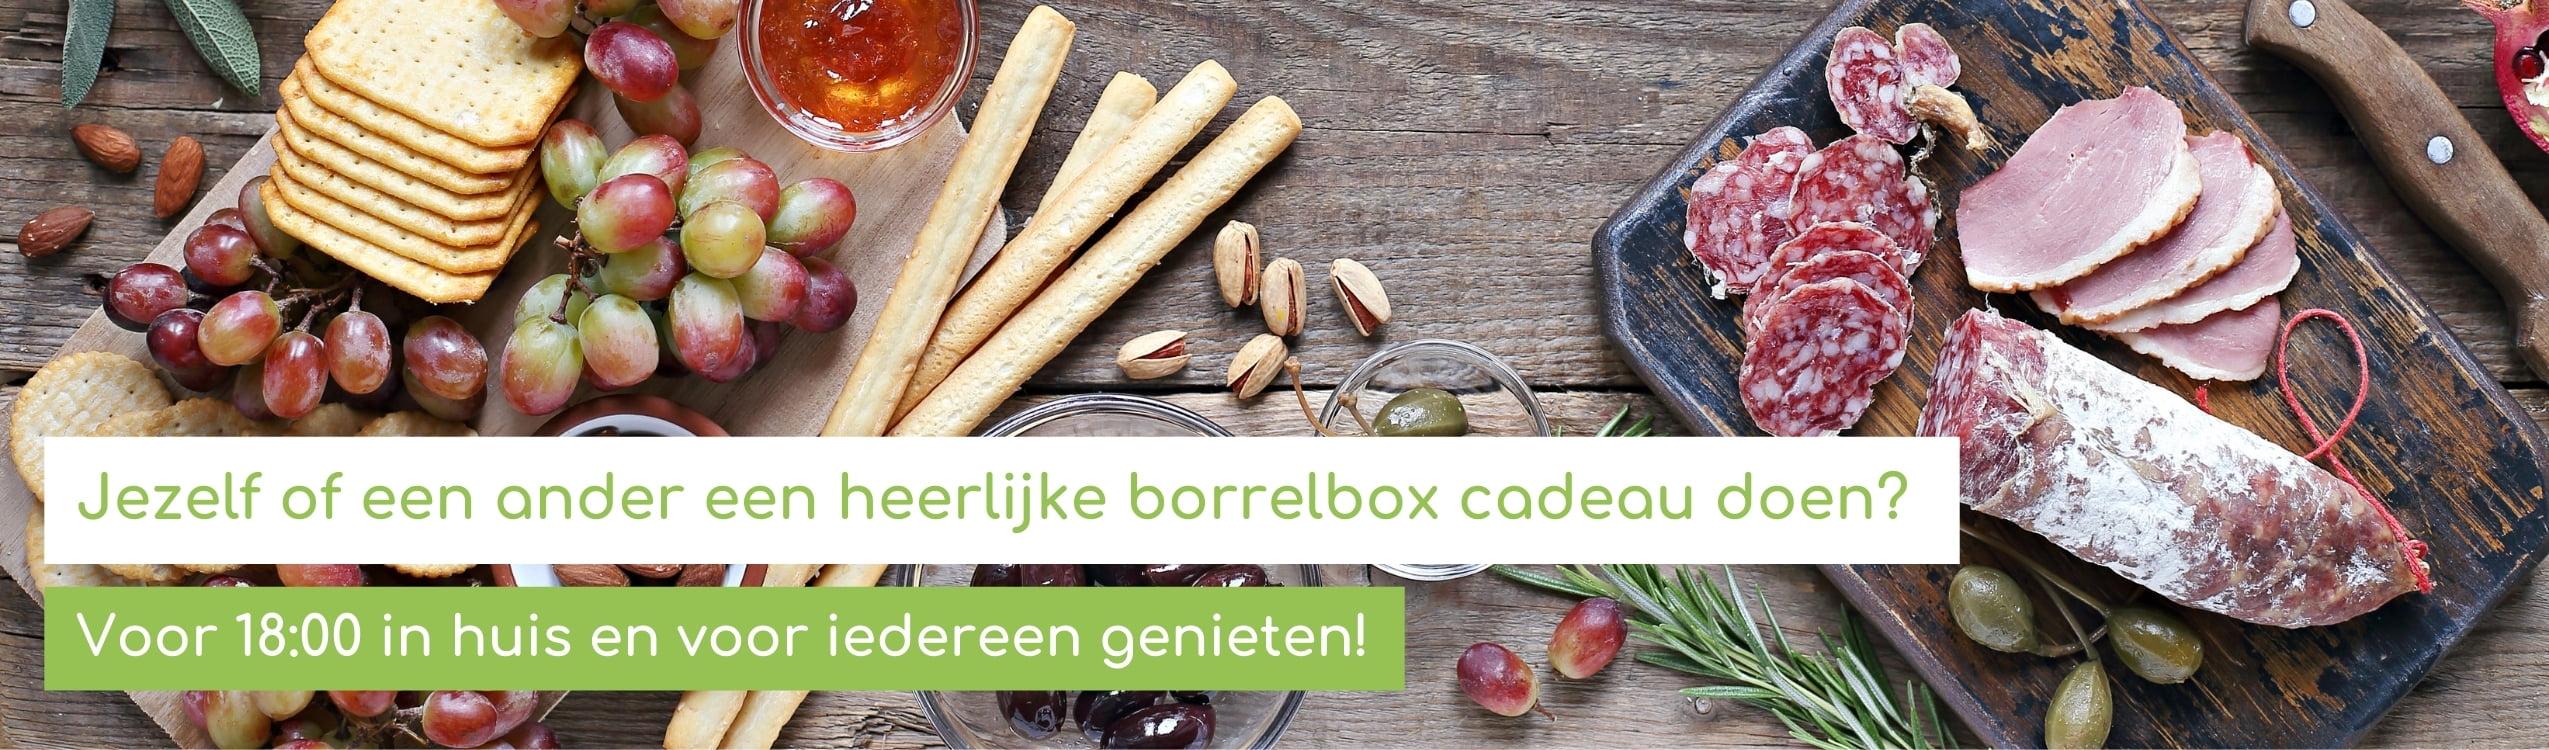 borrelbox-cadeau-doen